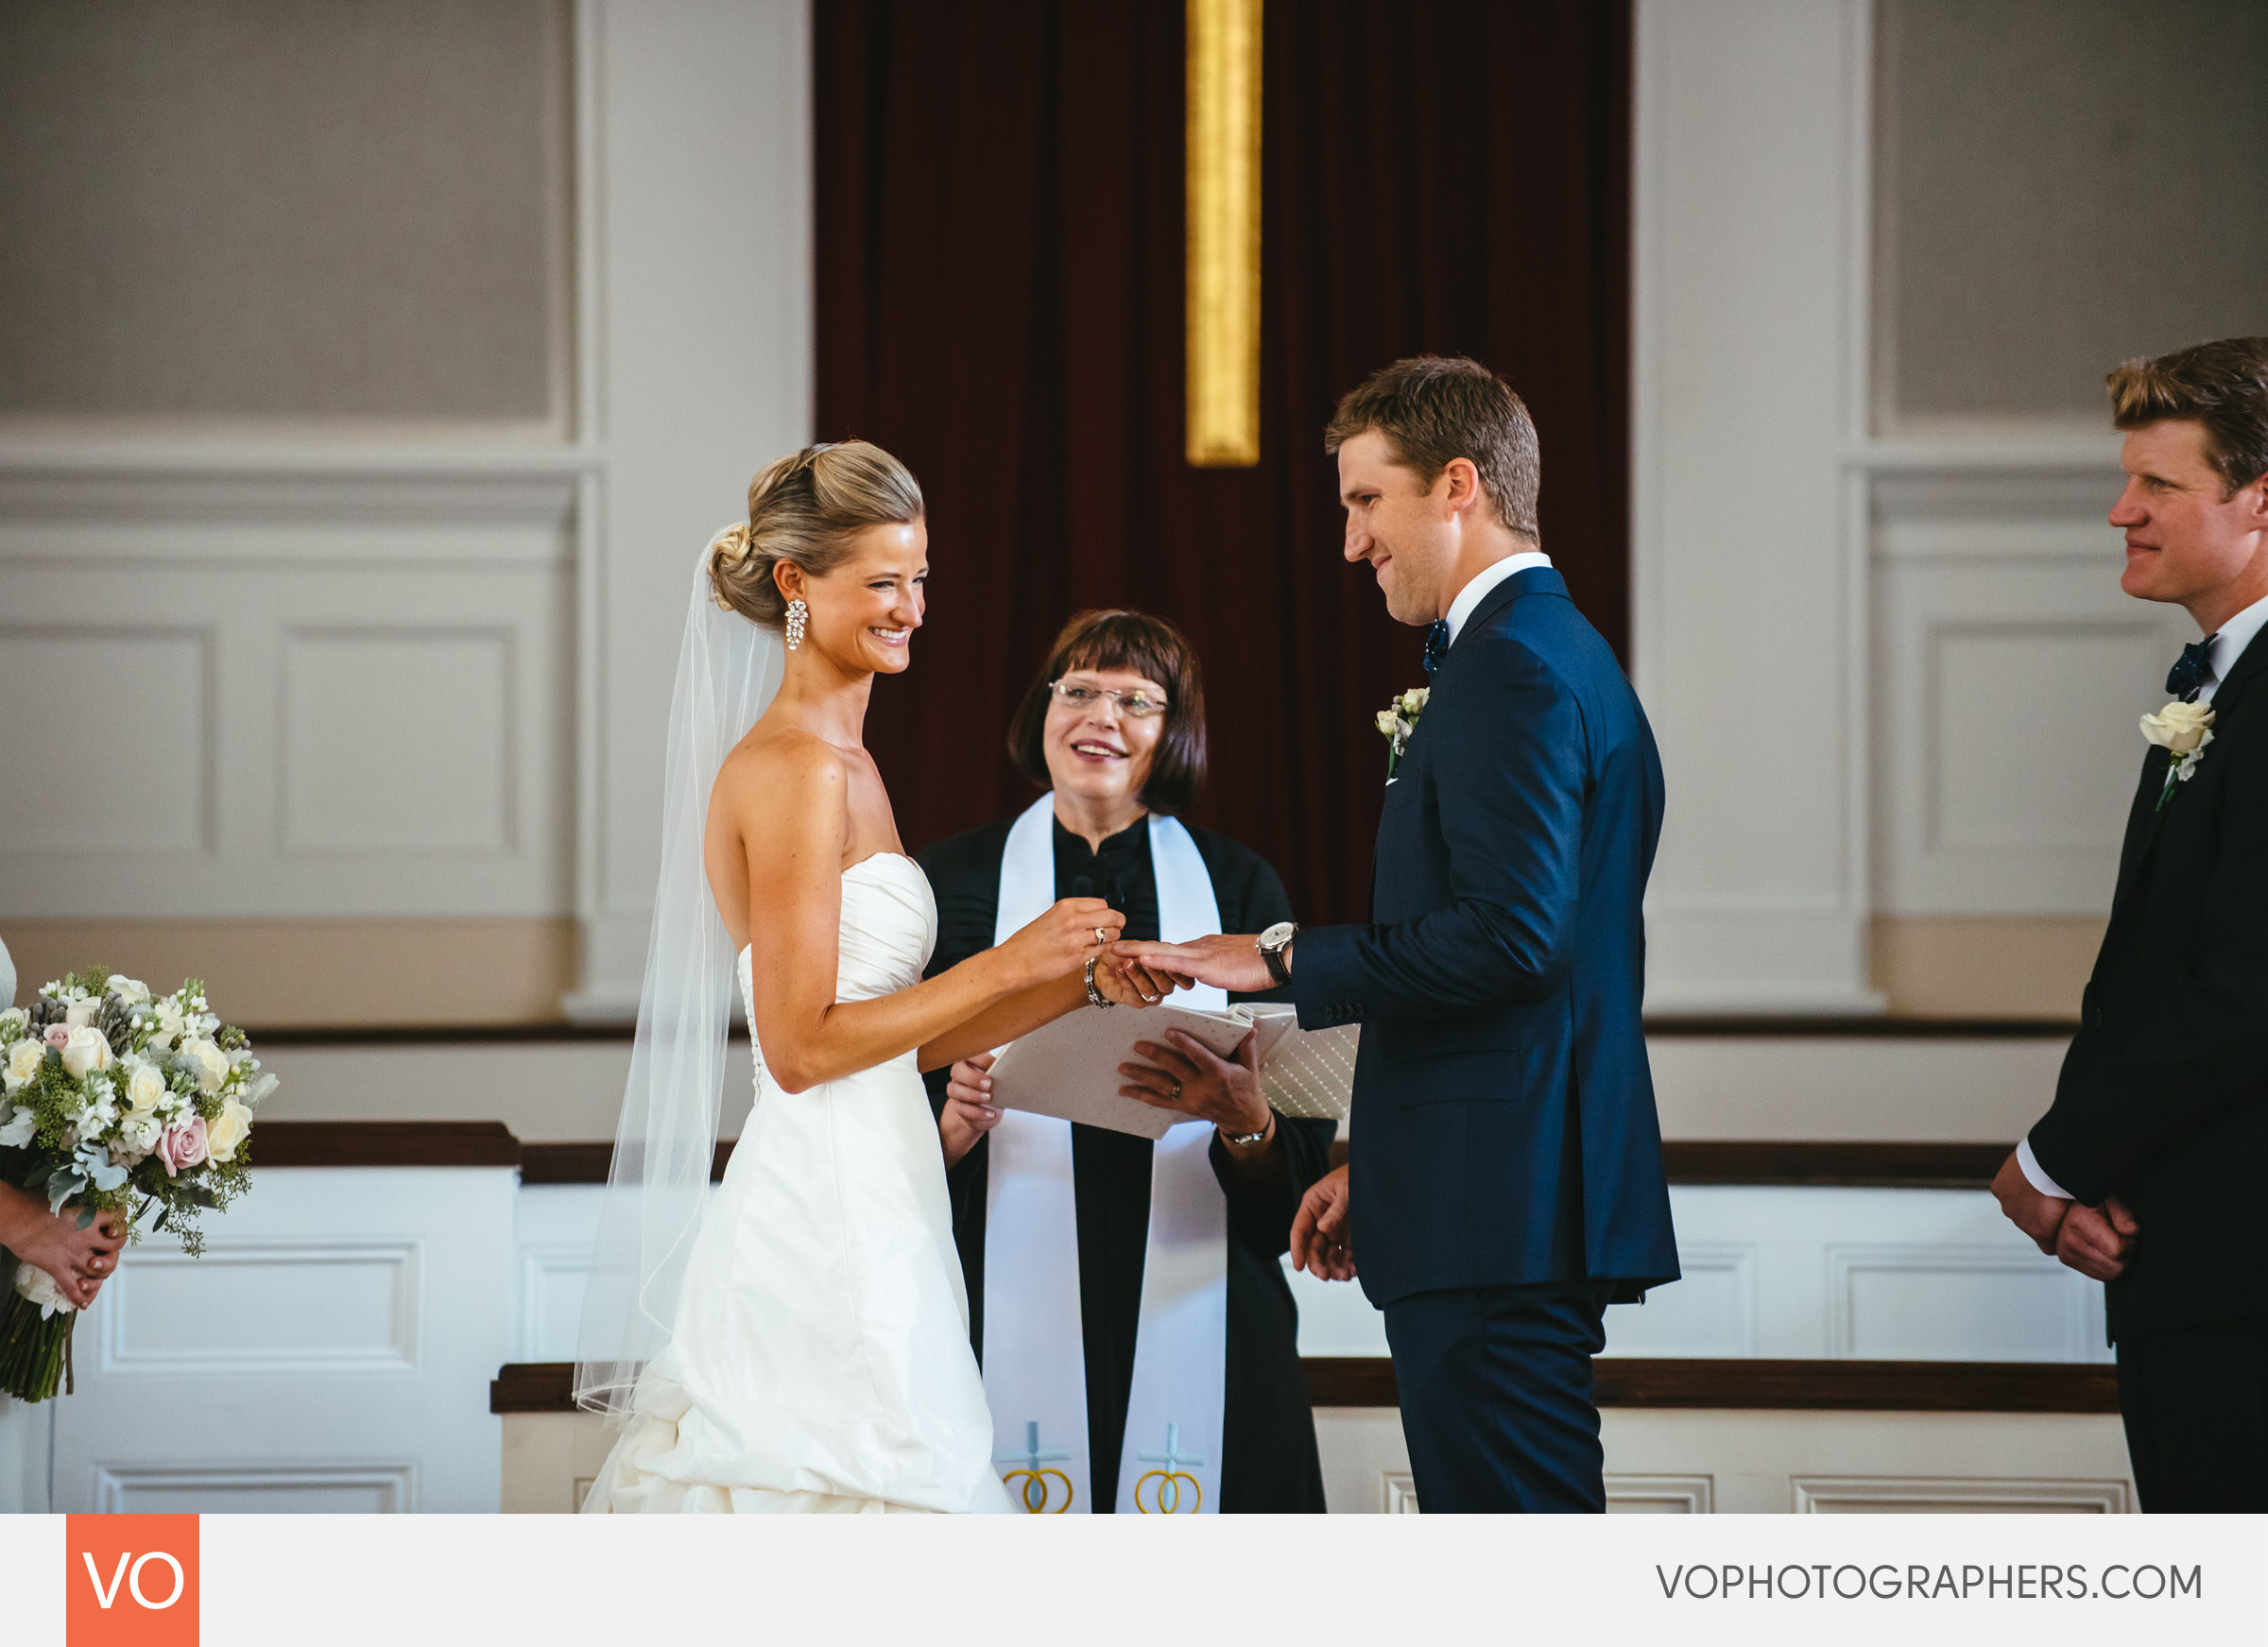 Lizzie-Ted-Stamford-Yacht-Club-Wedding-0021